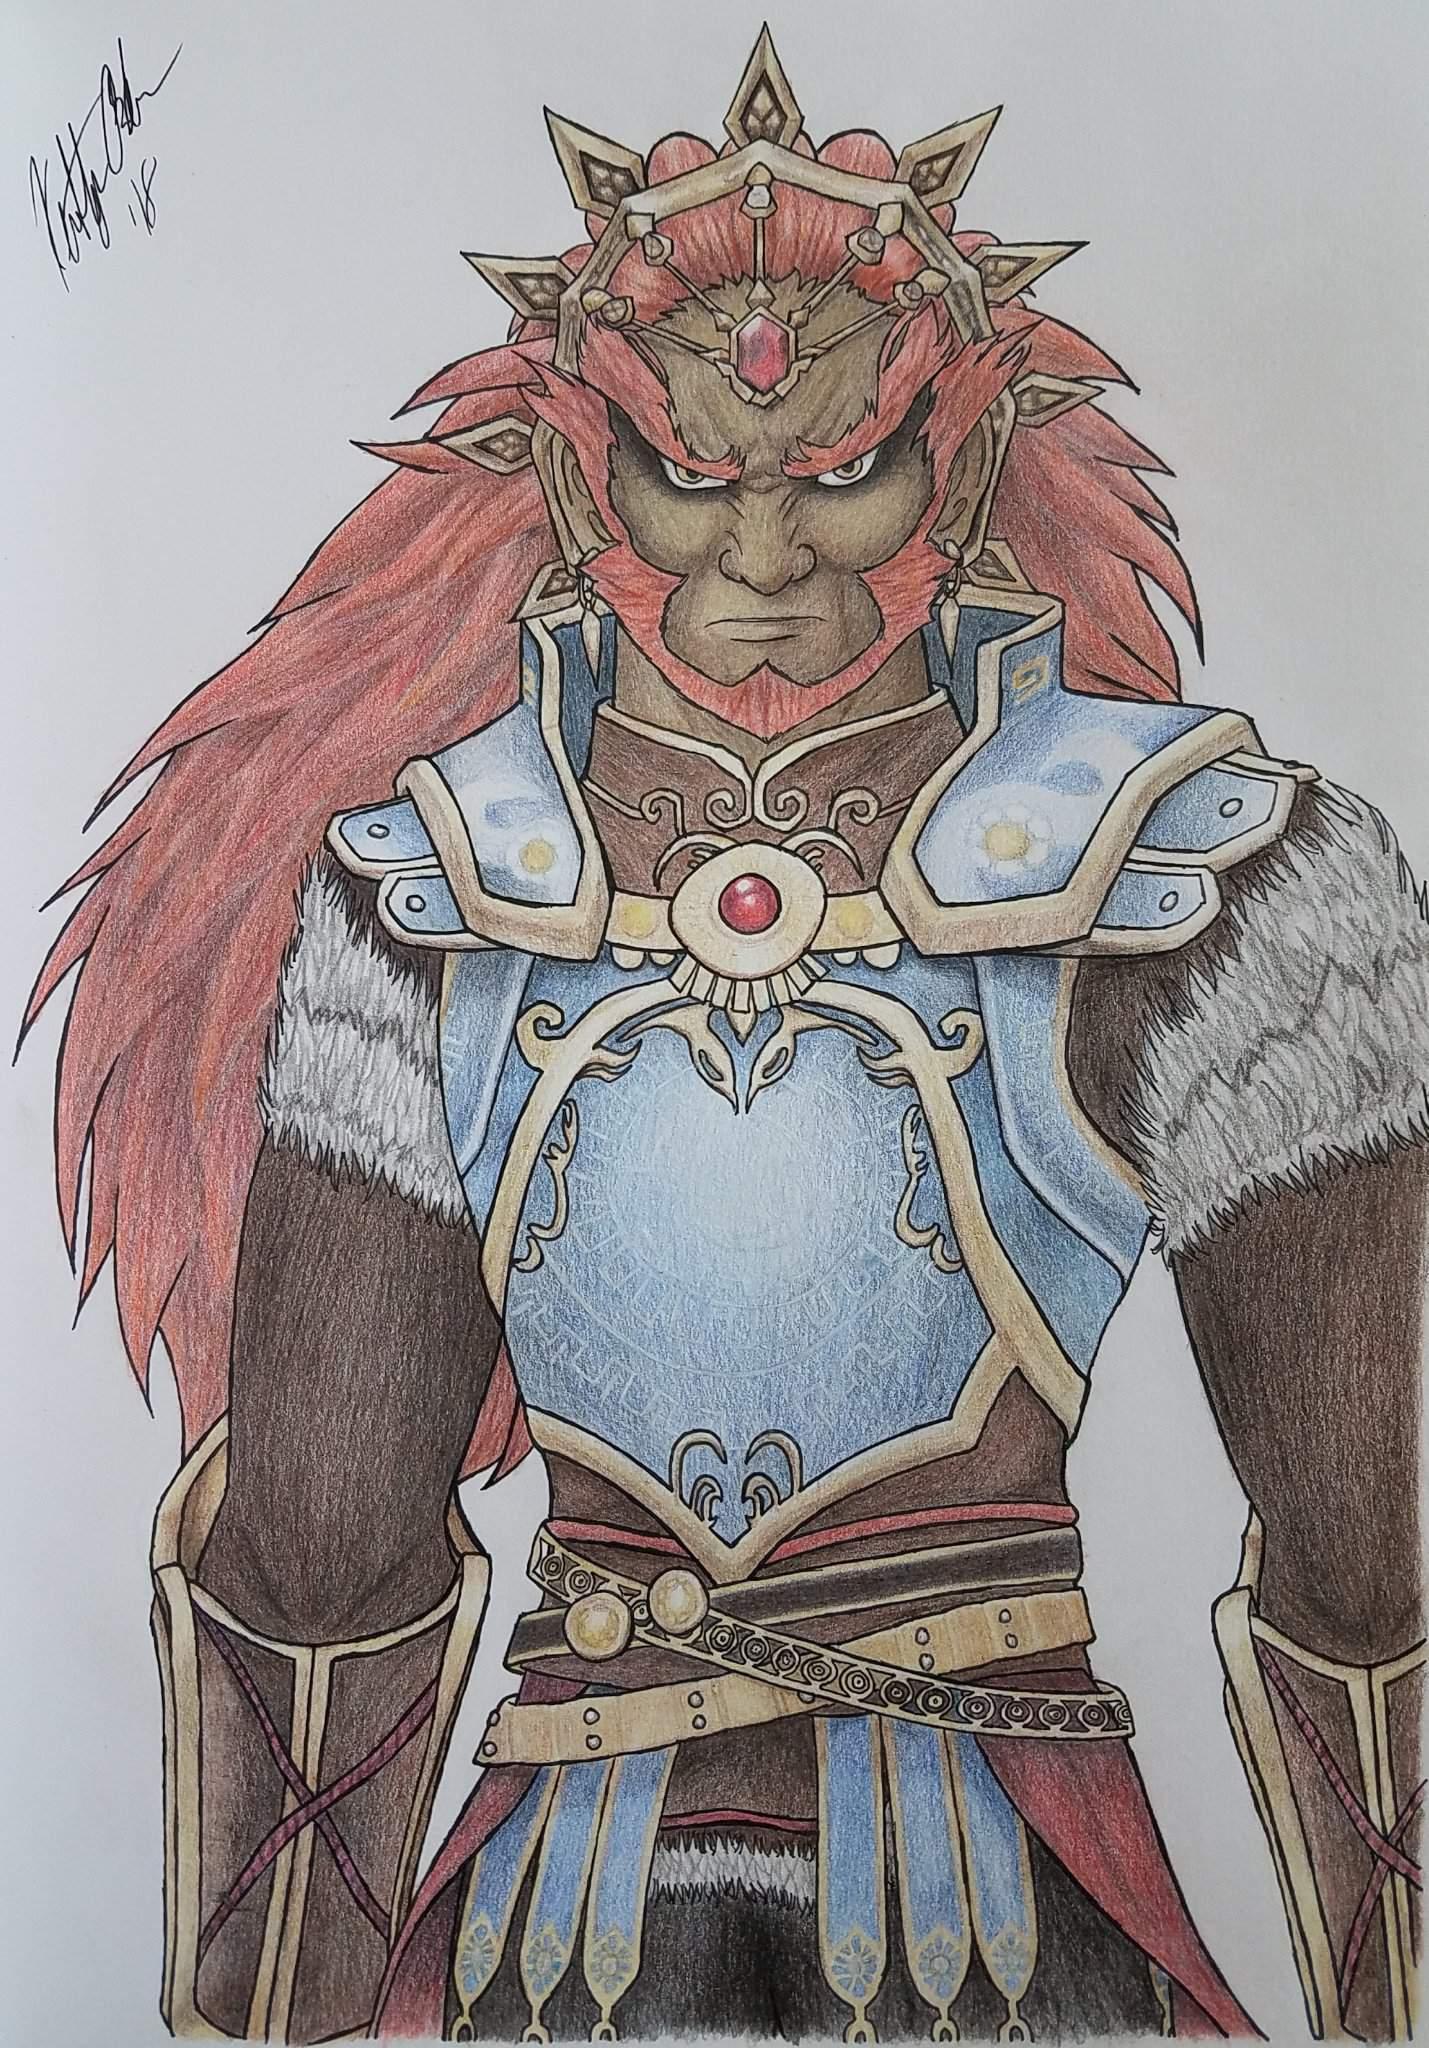 Ganondorf Hyrule Warriors Zelda Amino